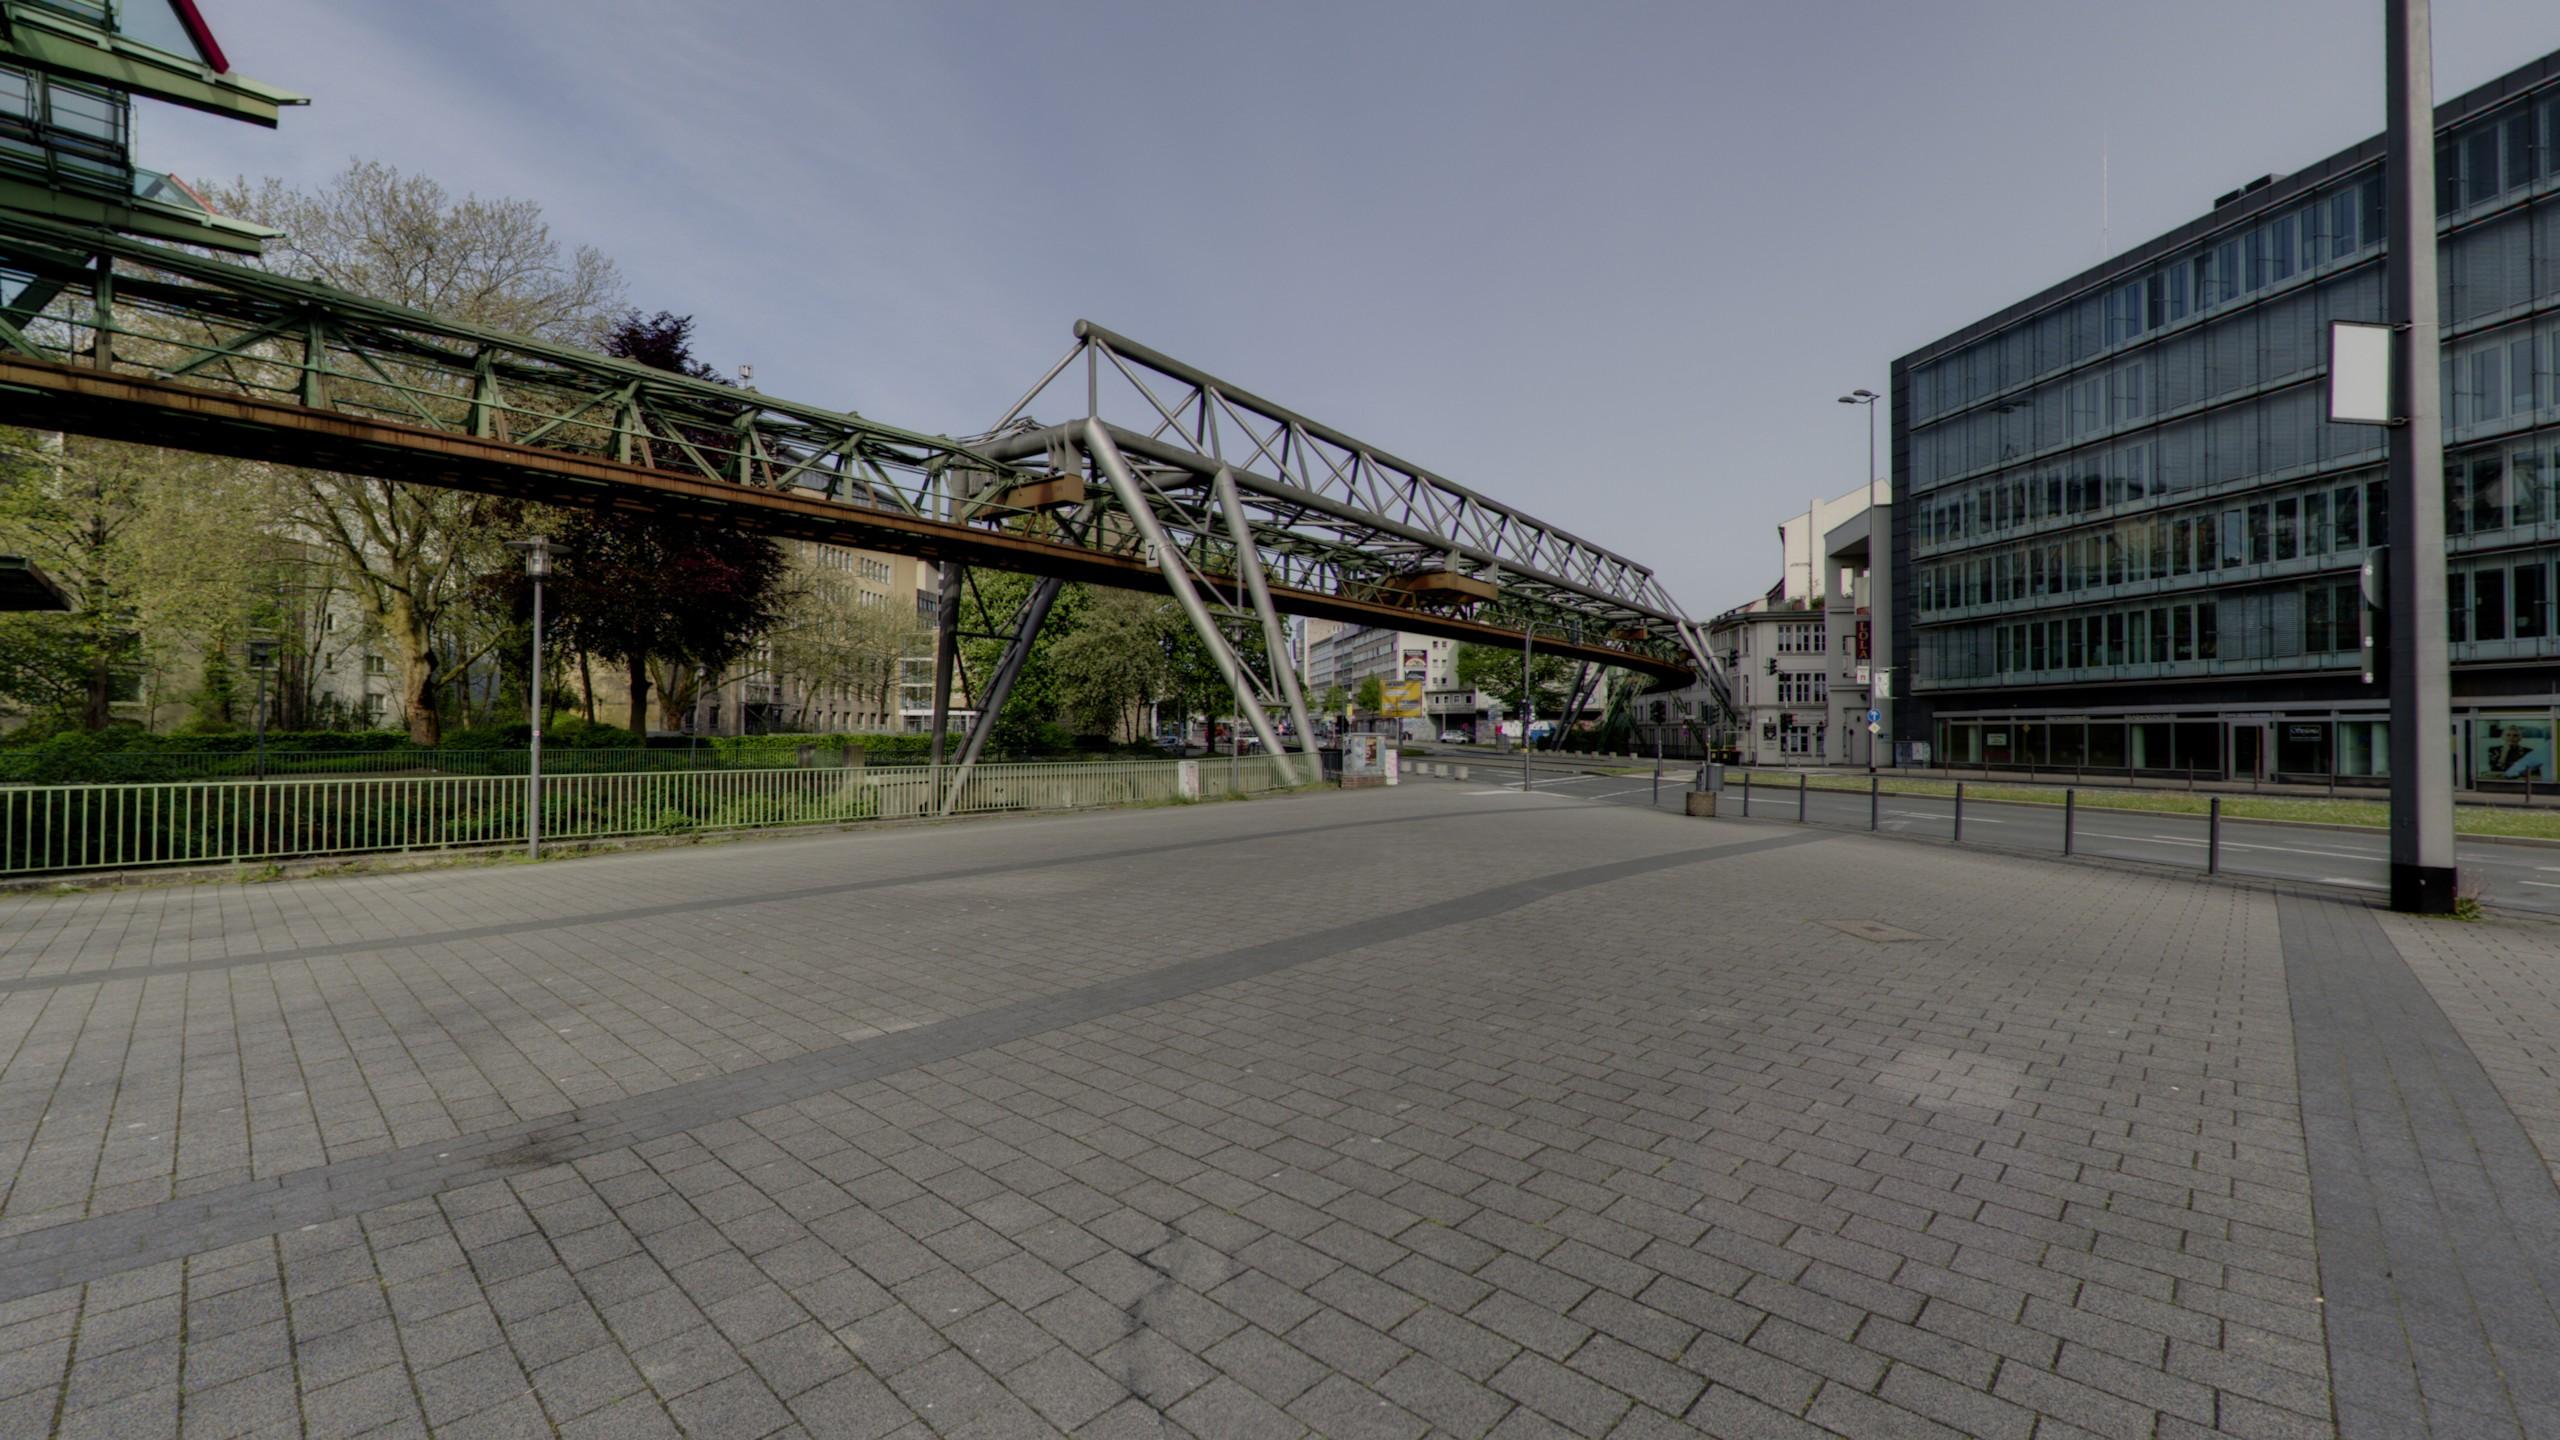 Virtuelle rundgänge, Virtuelle Rundgänge, KHSFotographie